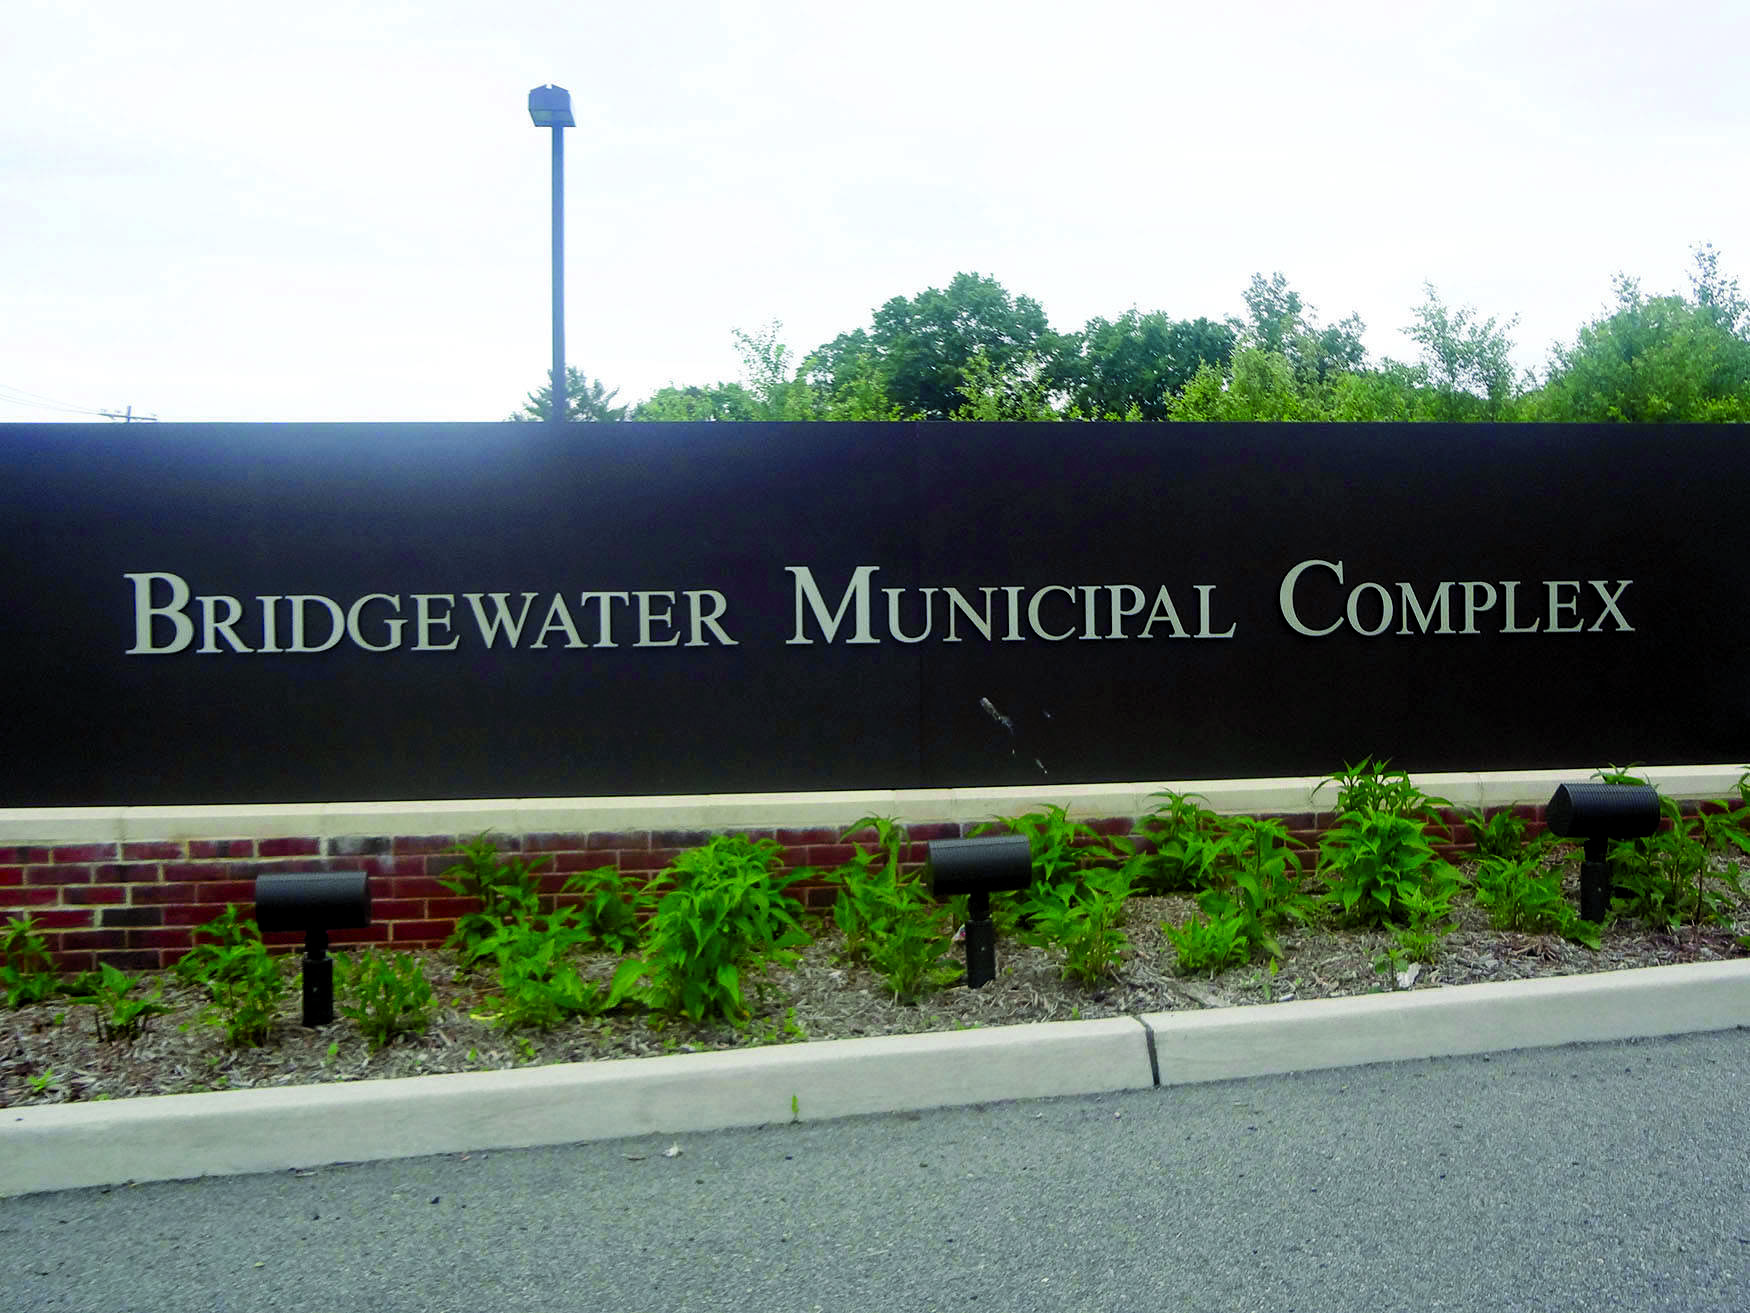 4620d413b10626279d88_Bridgewater_municipal.jpg